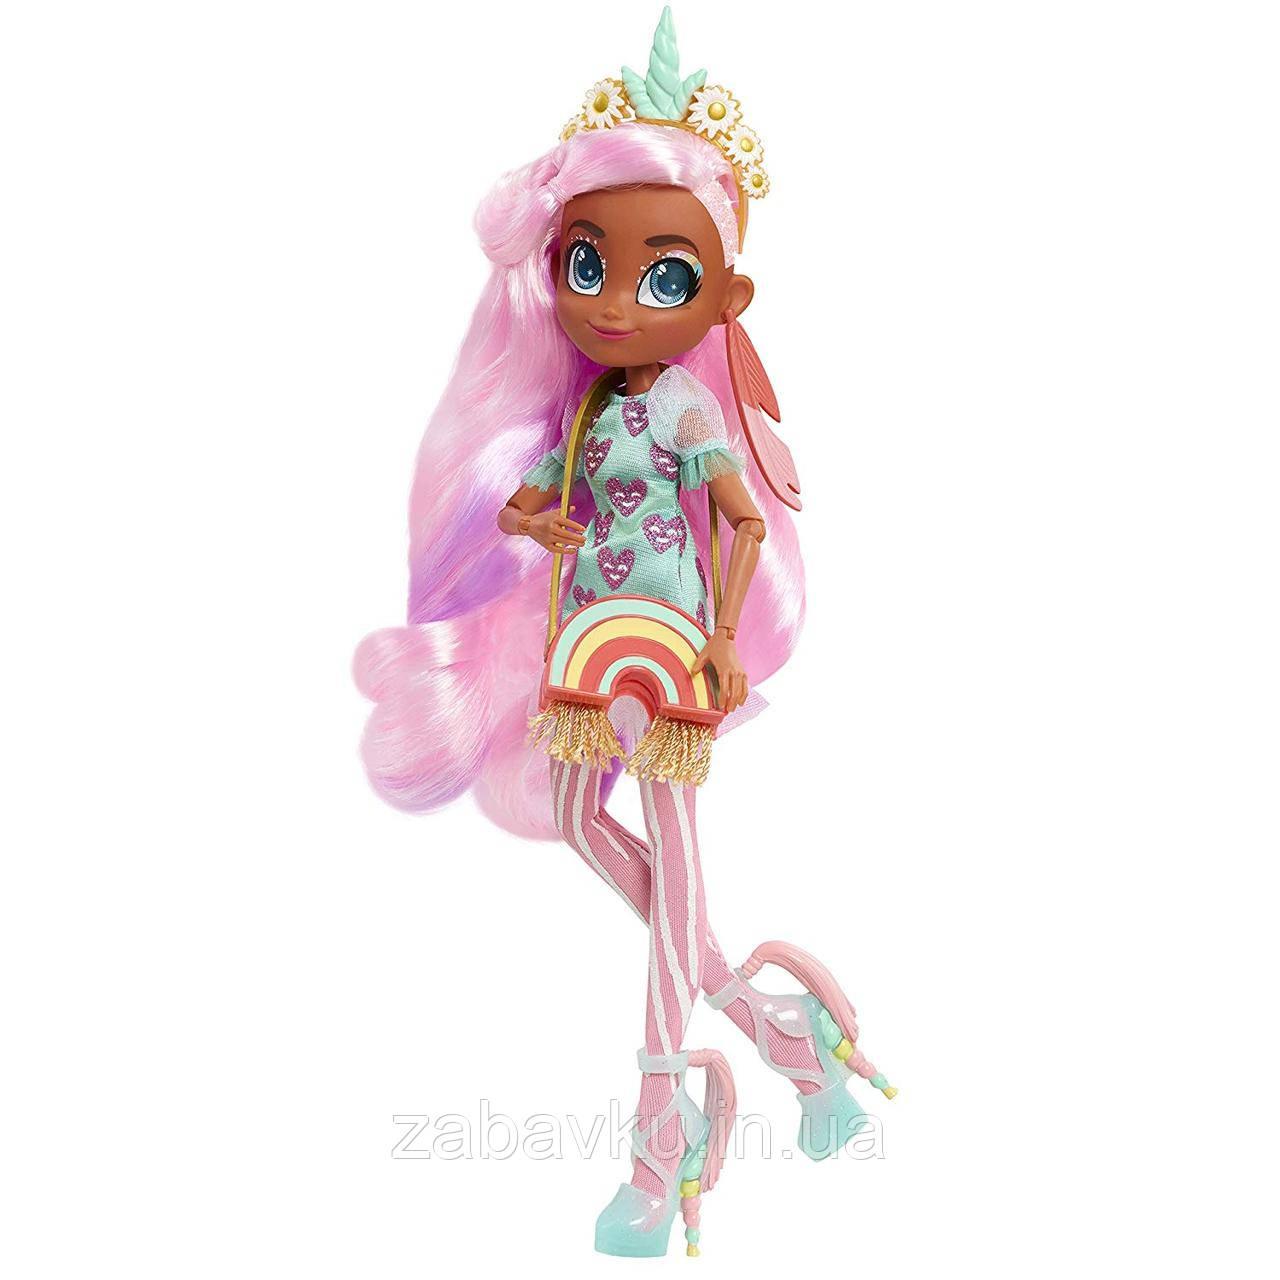 Велика лялька Хердораблс Віллоу Hairdorables Hairmazing Doll - Willow